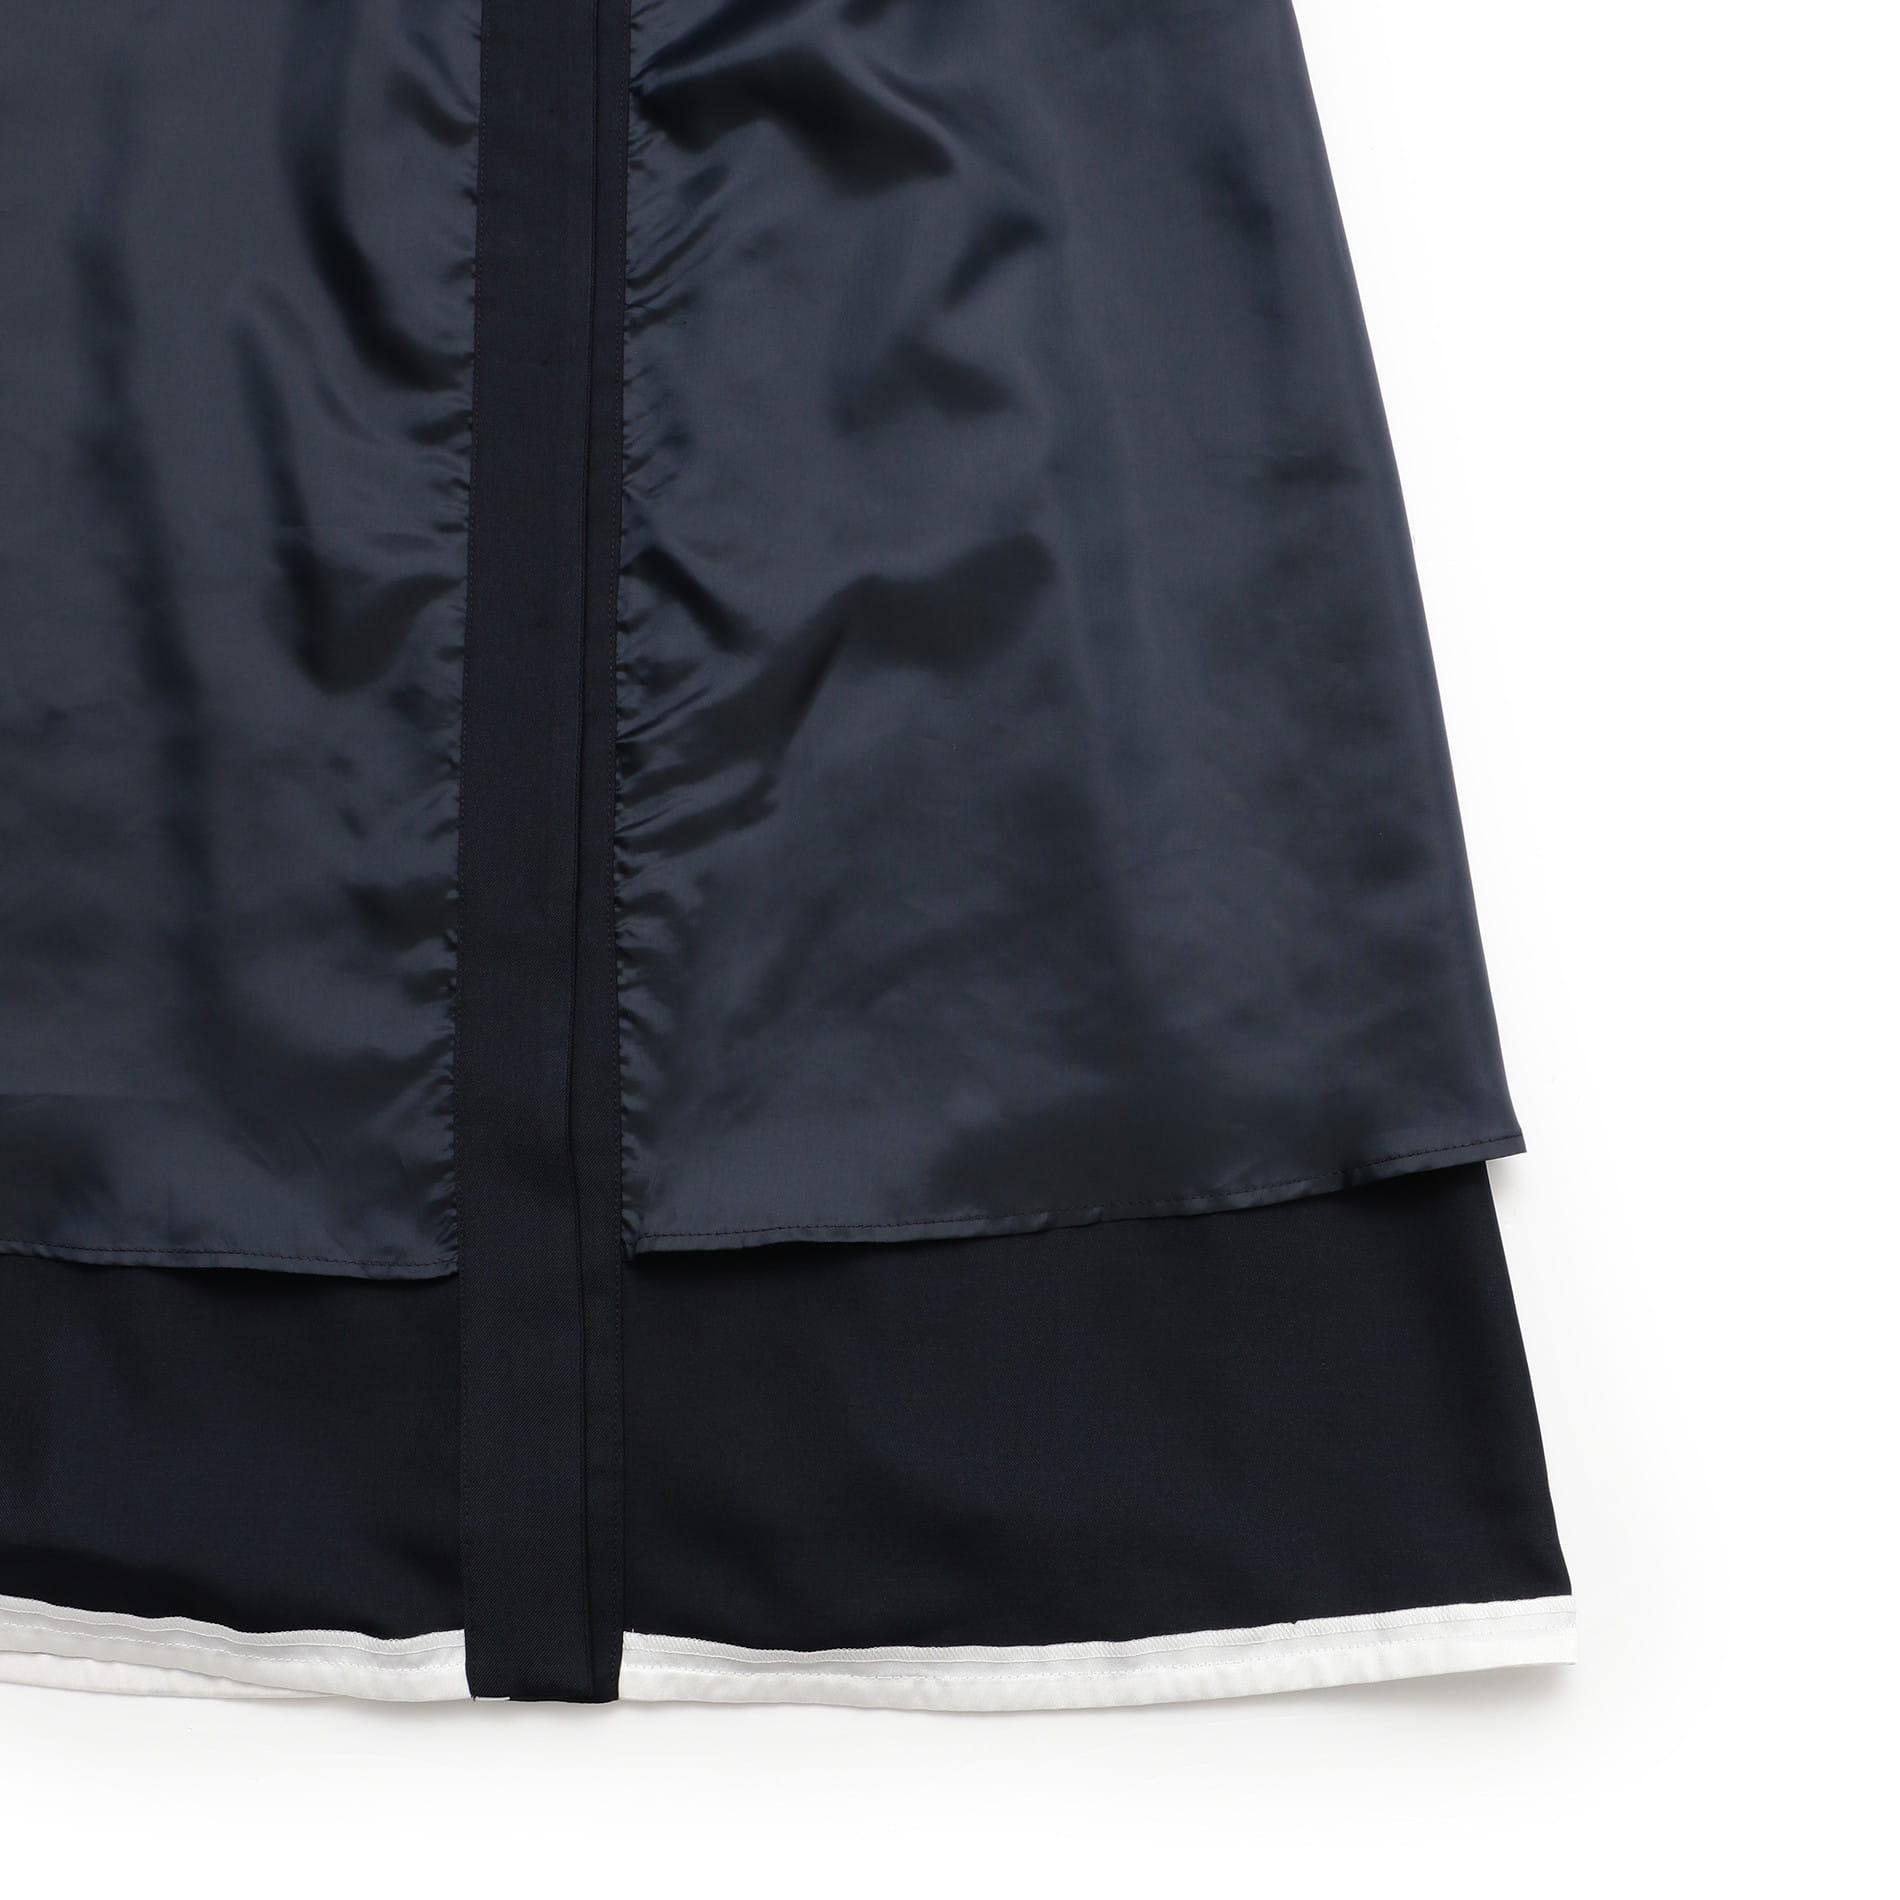 【GUILD PRIME】WOMEN バイカラーパイピングシャツドレス